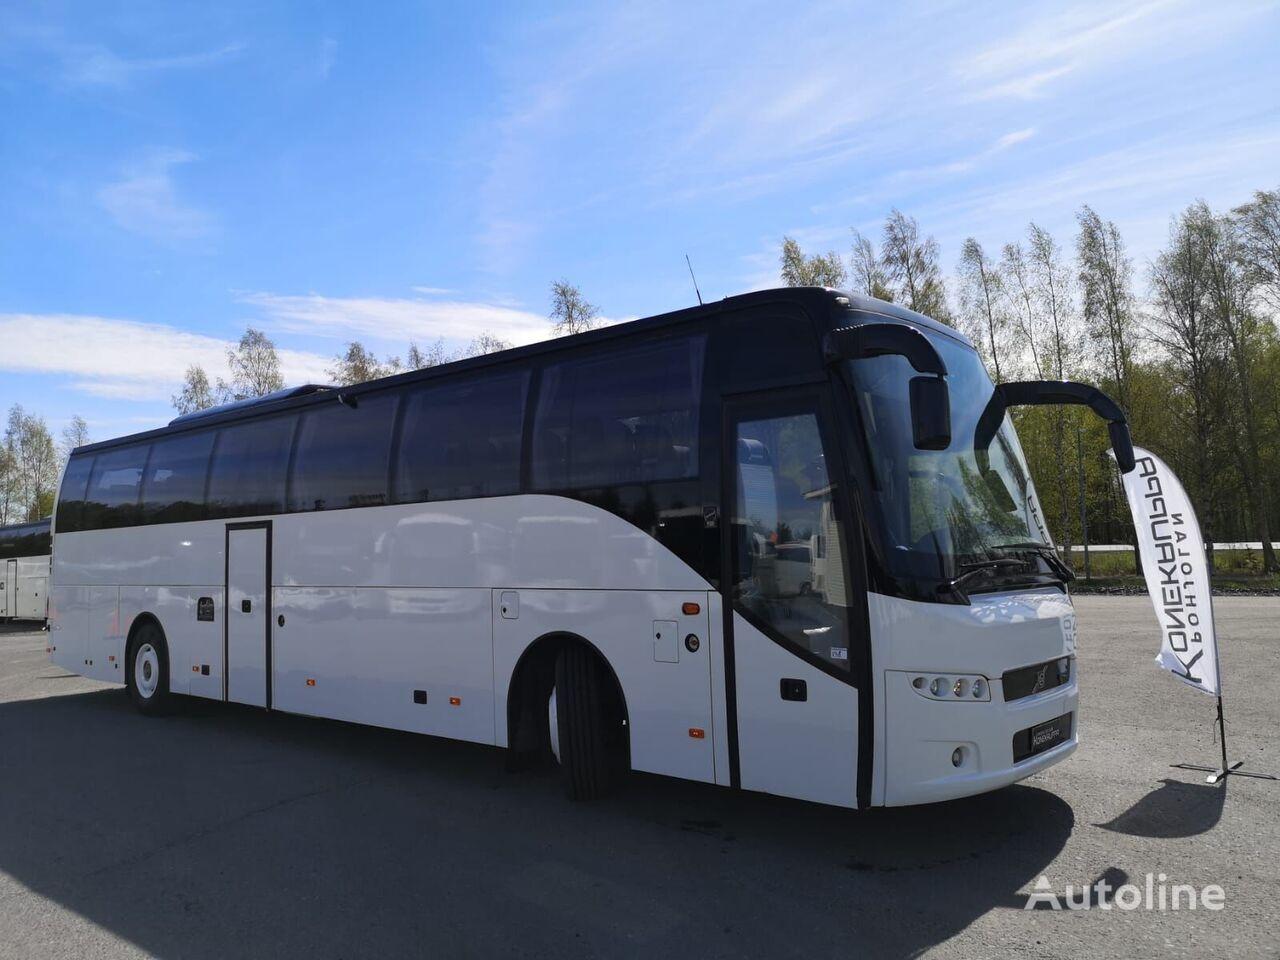 VOLVO 9700-9500 coach bus